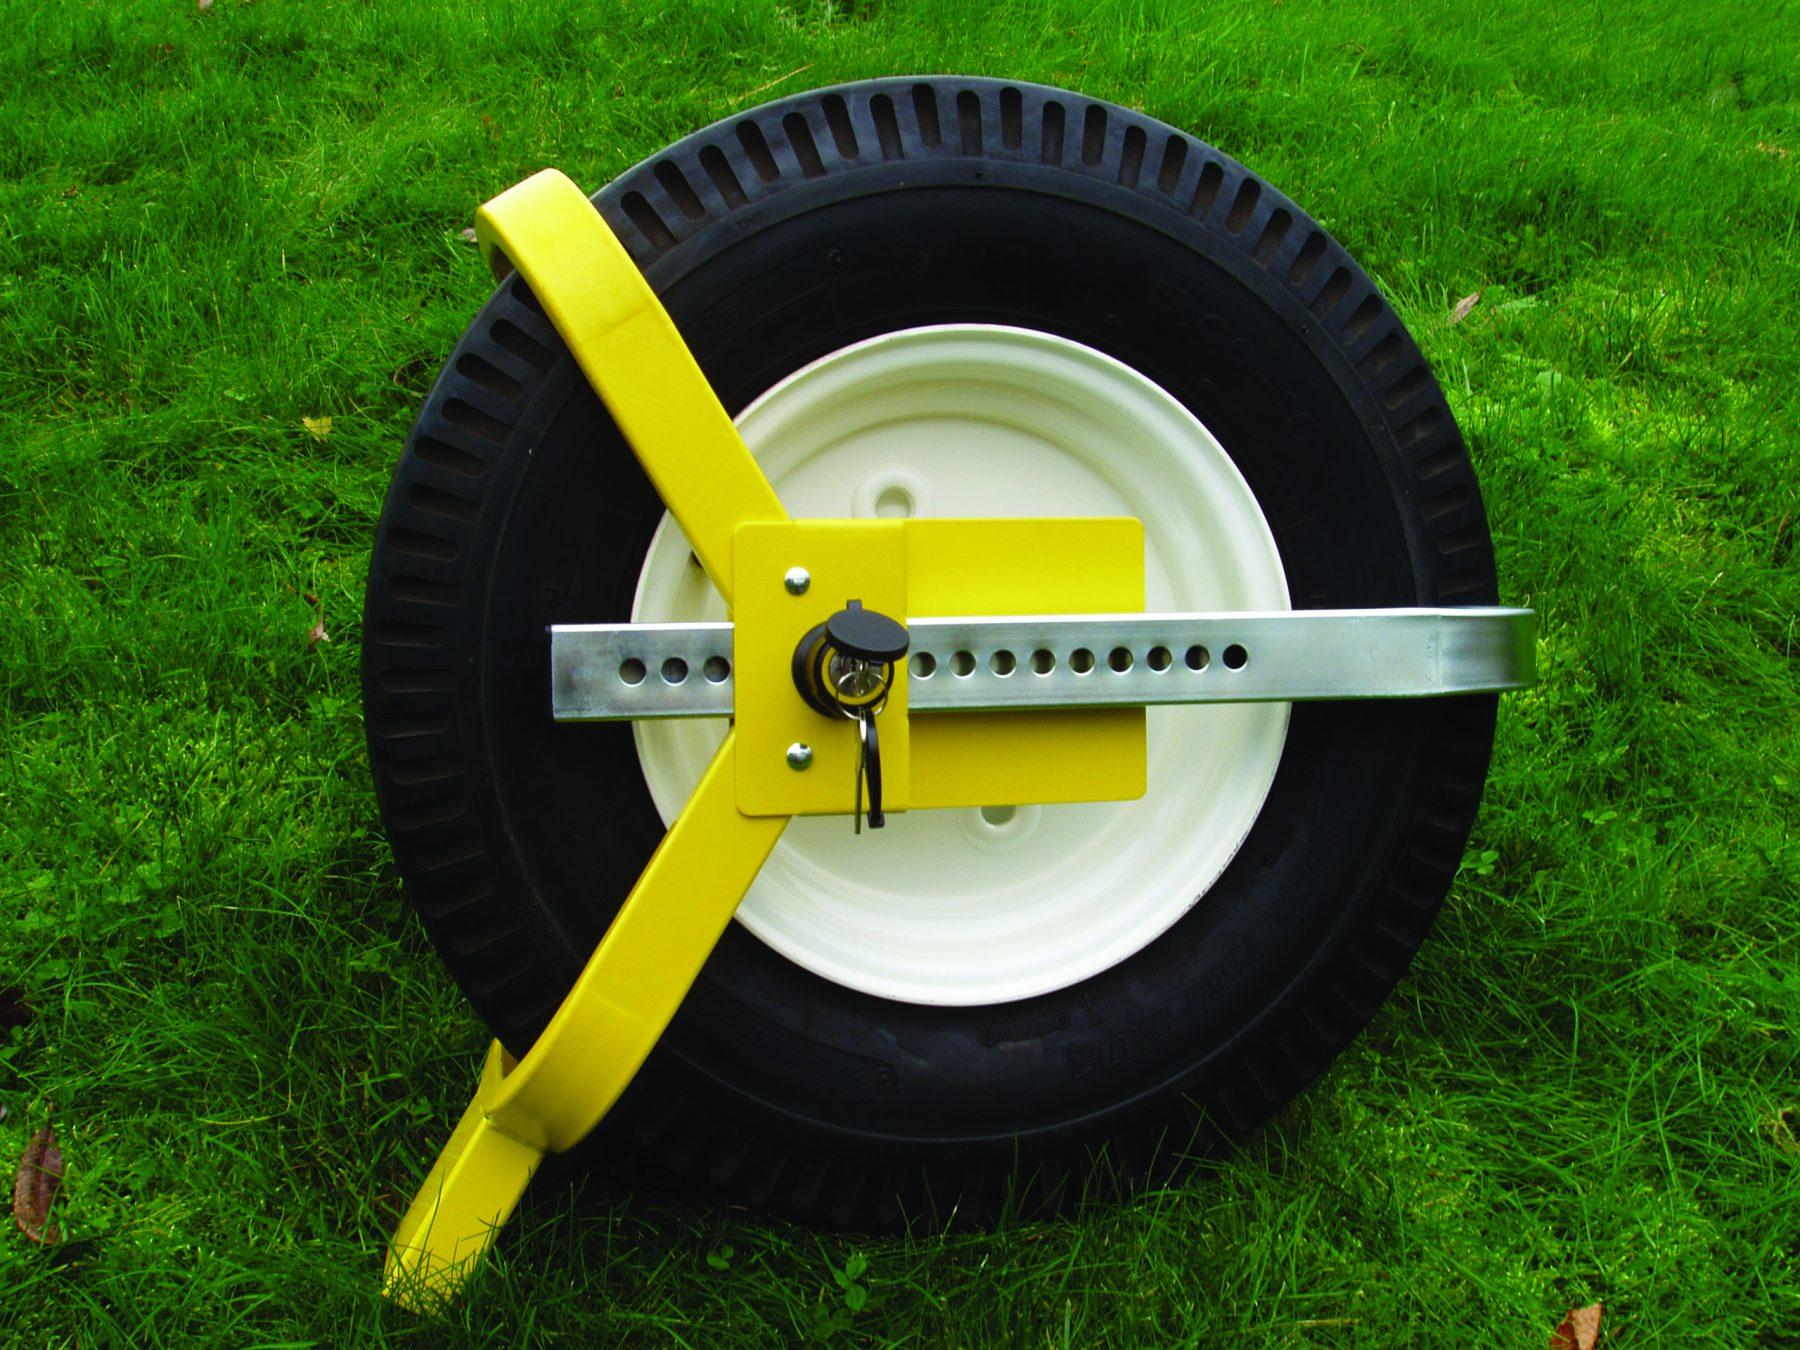 Milenco Wraith Wheel Lock Insurance Approved Caravan Security Accessories